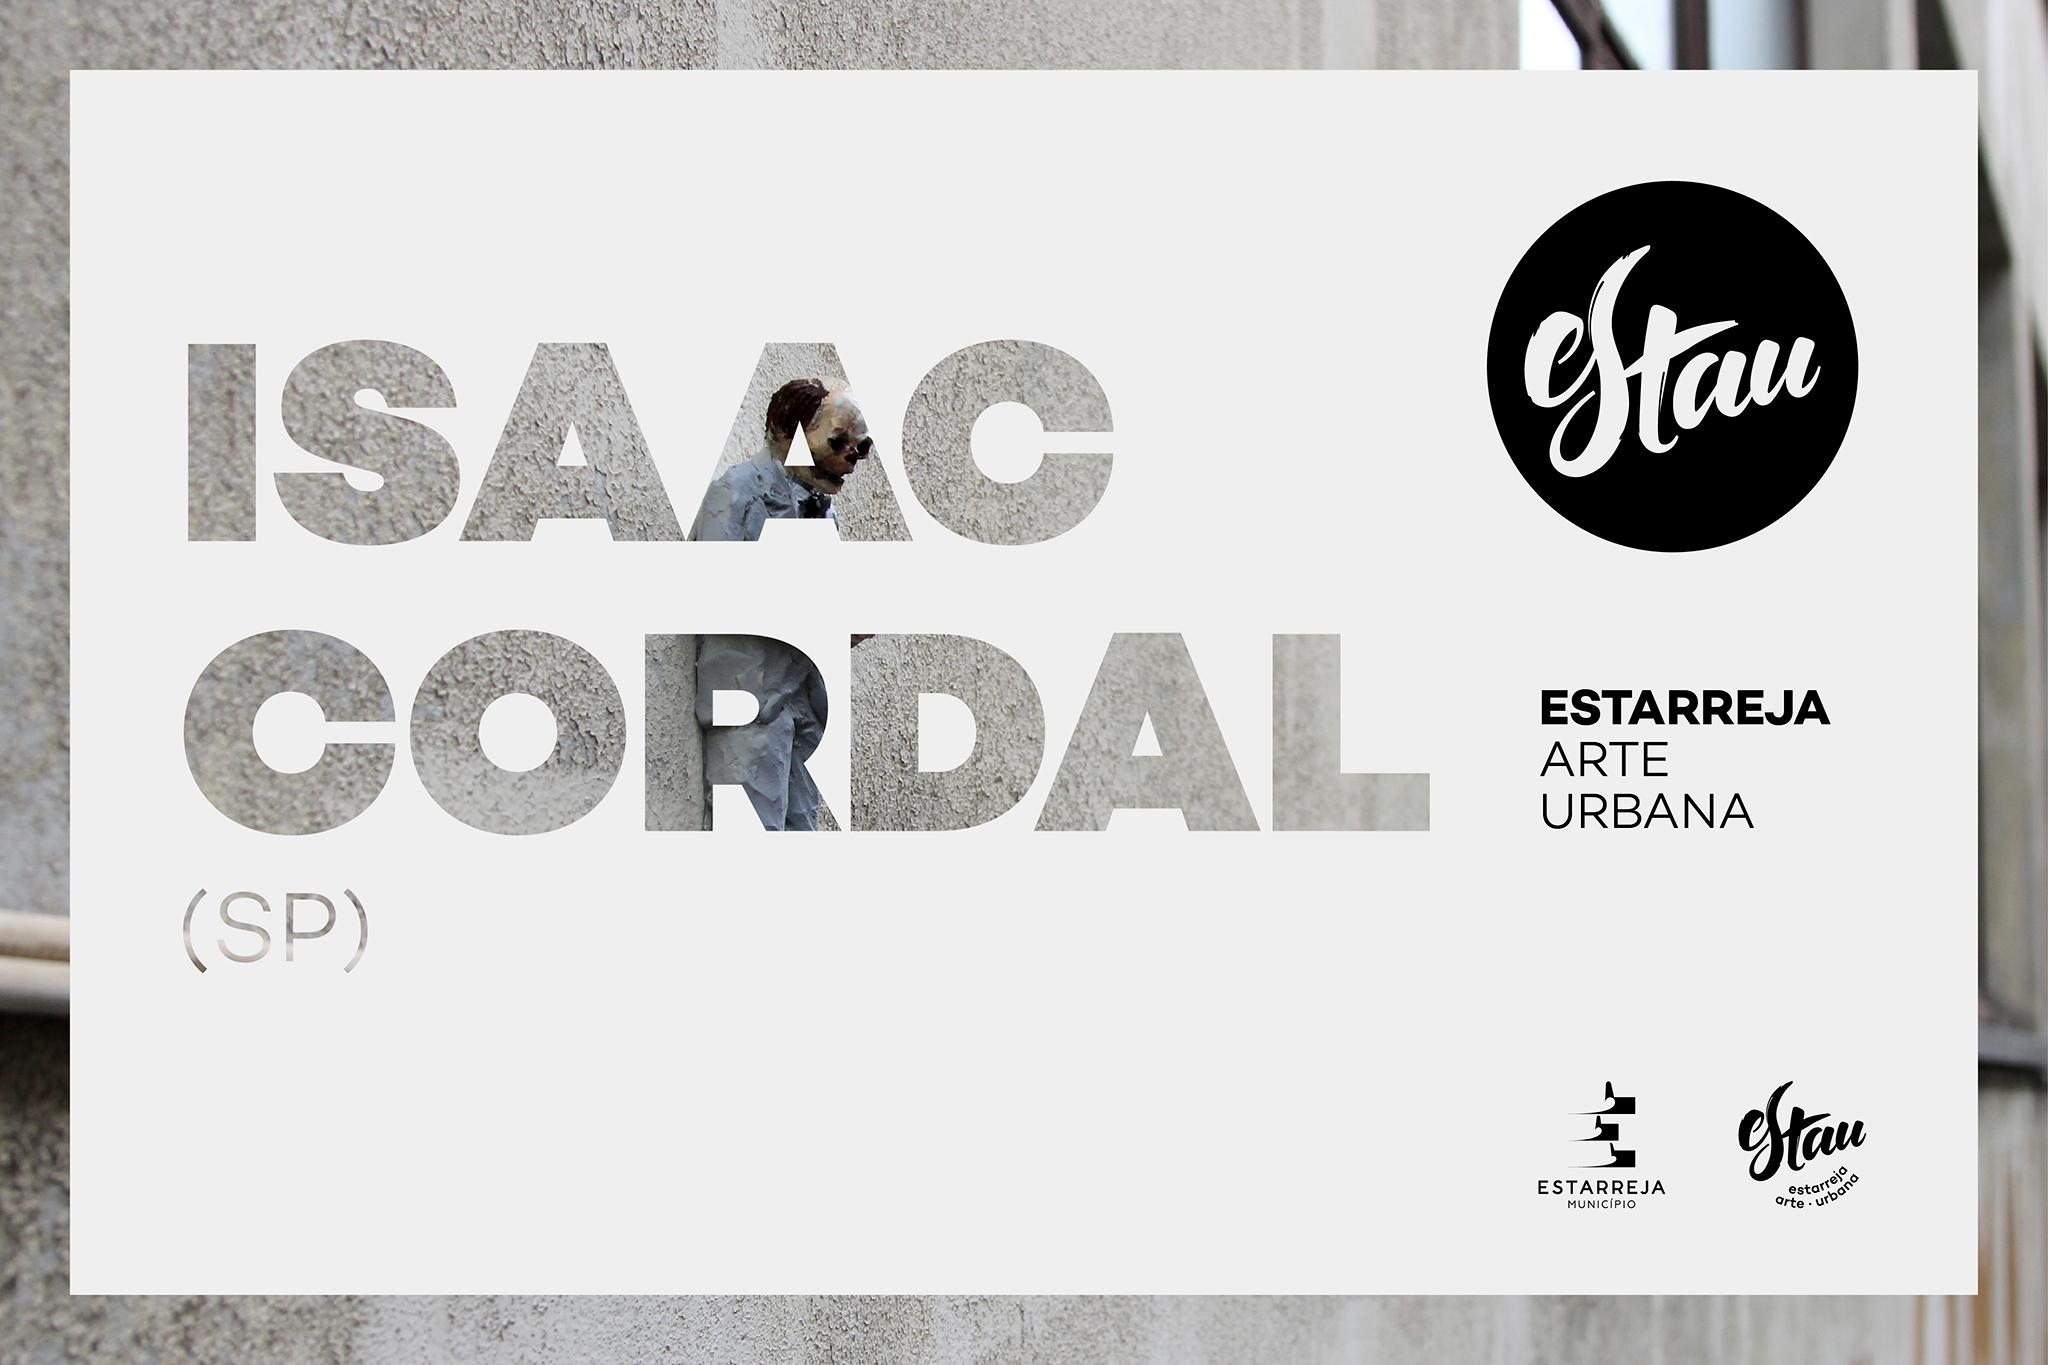 05-1-_-isaac-cordal-es